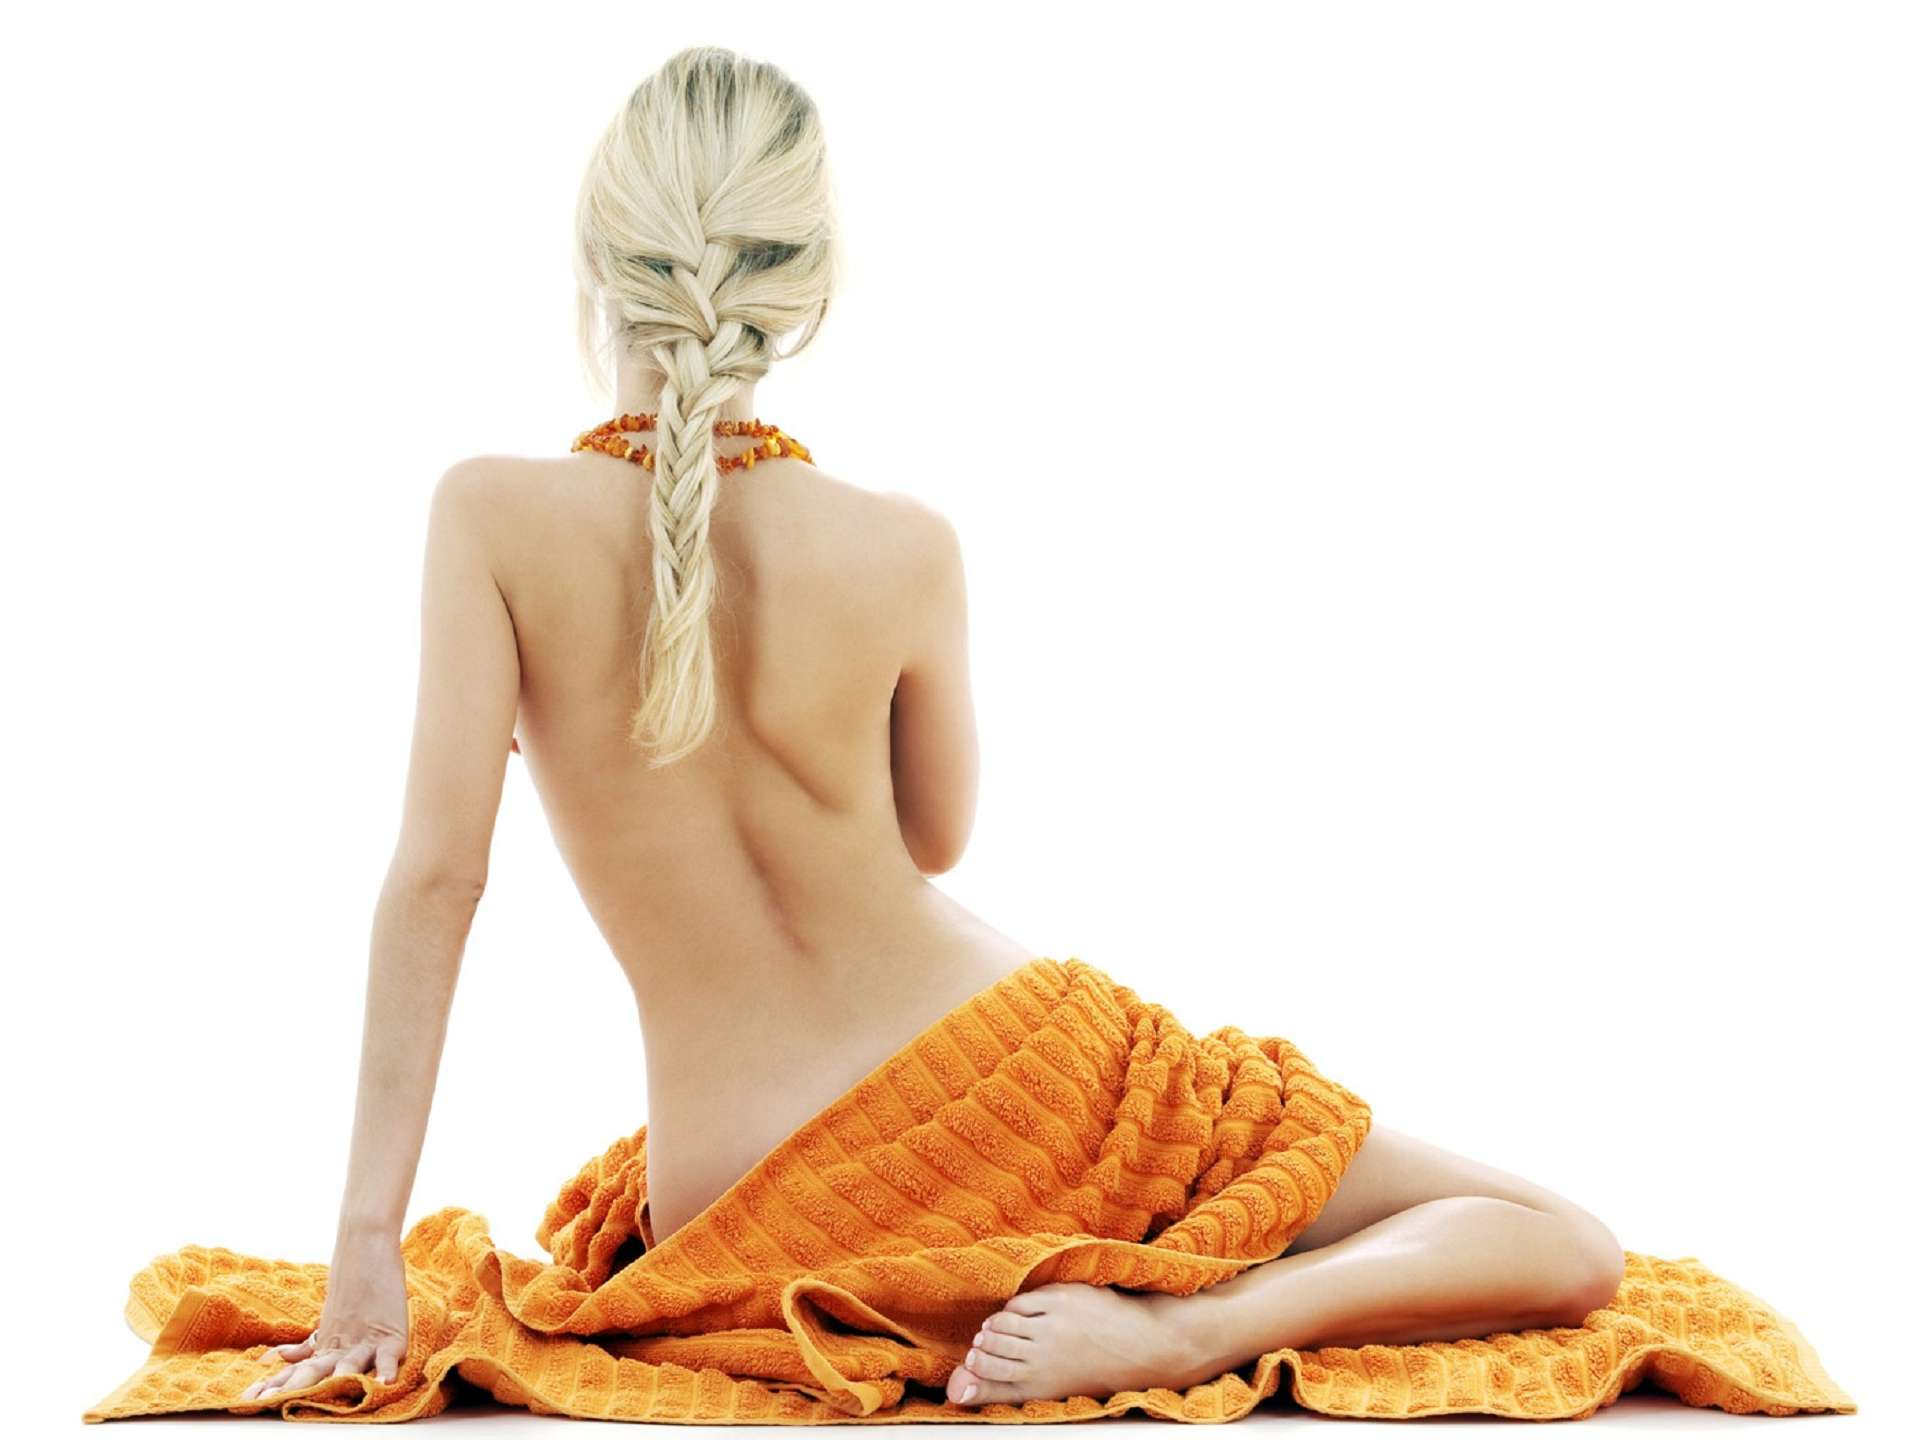 Увеличение груди через надрезы по соск